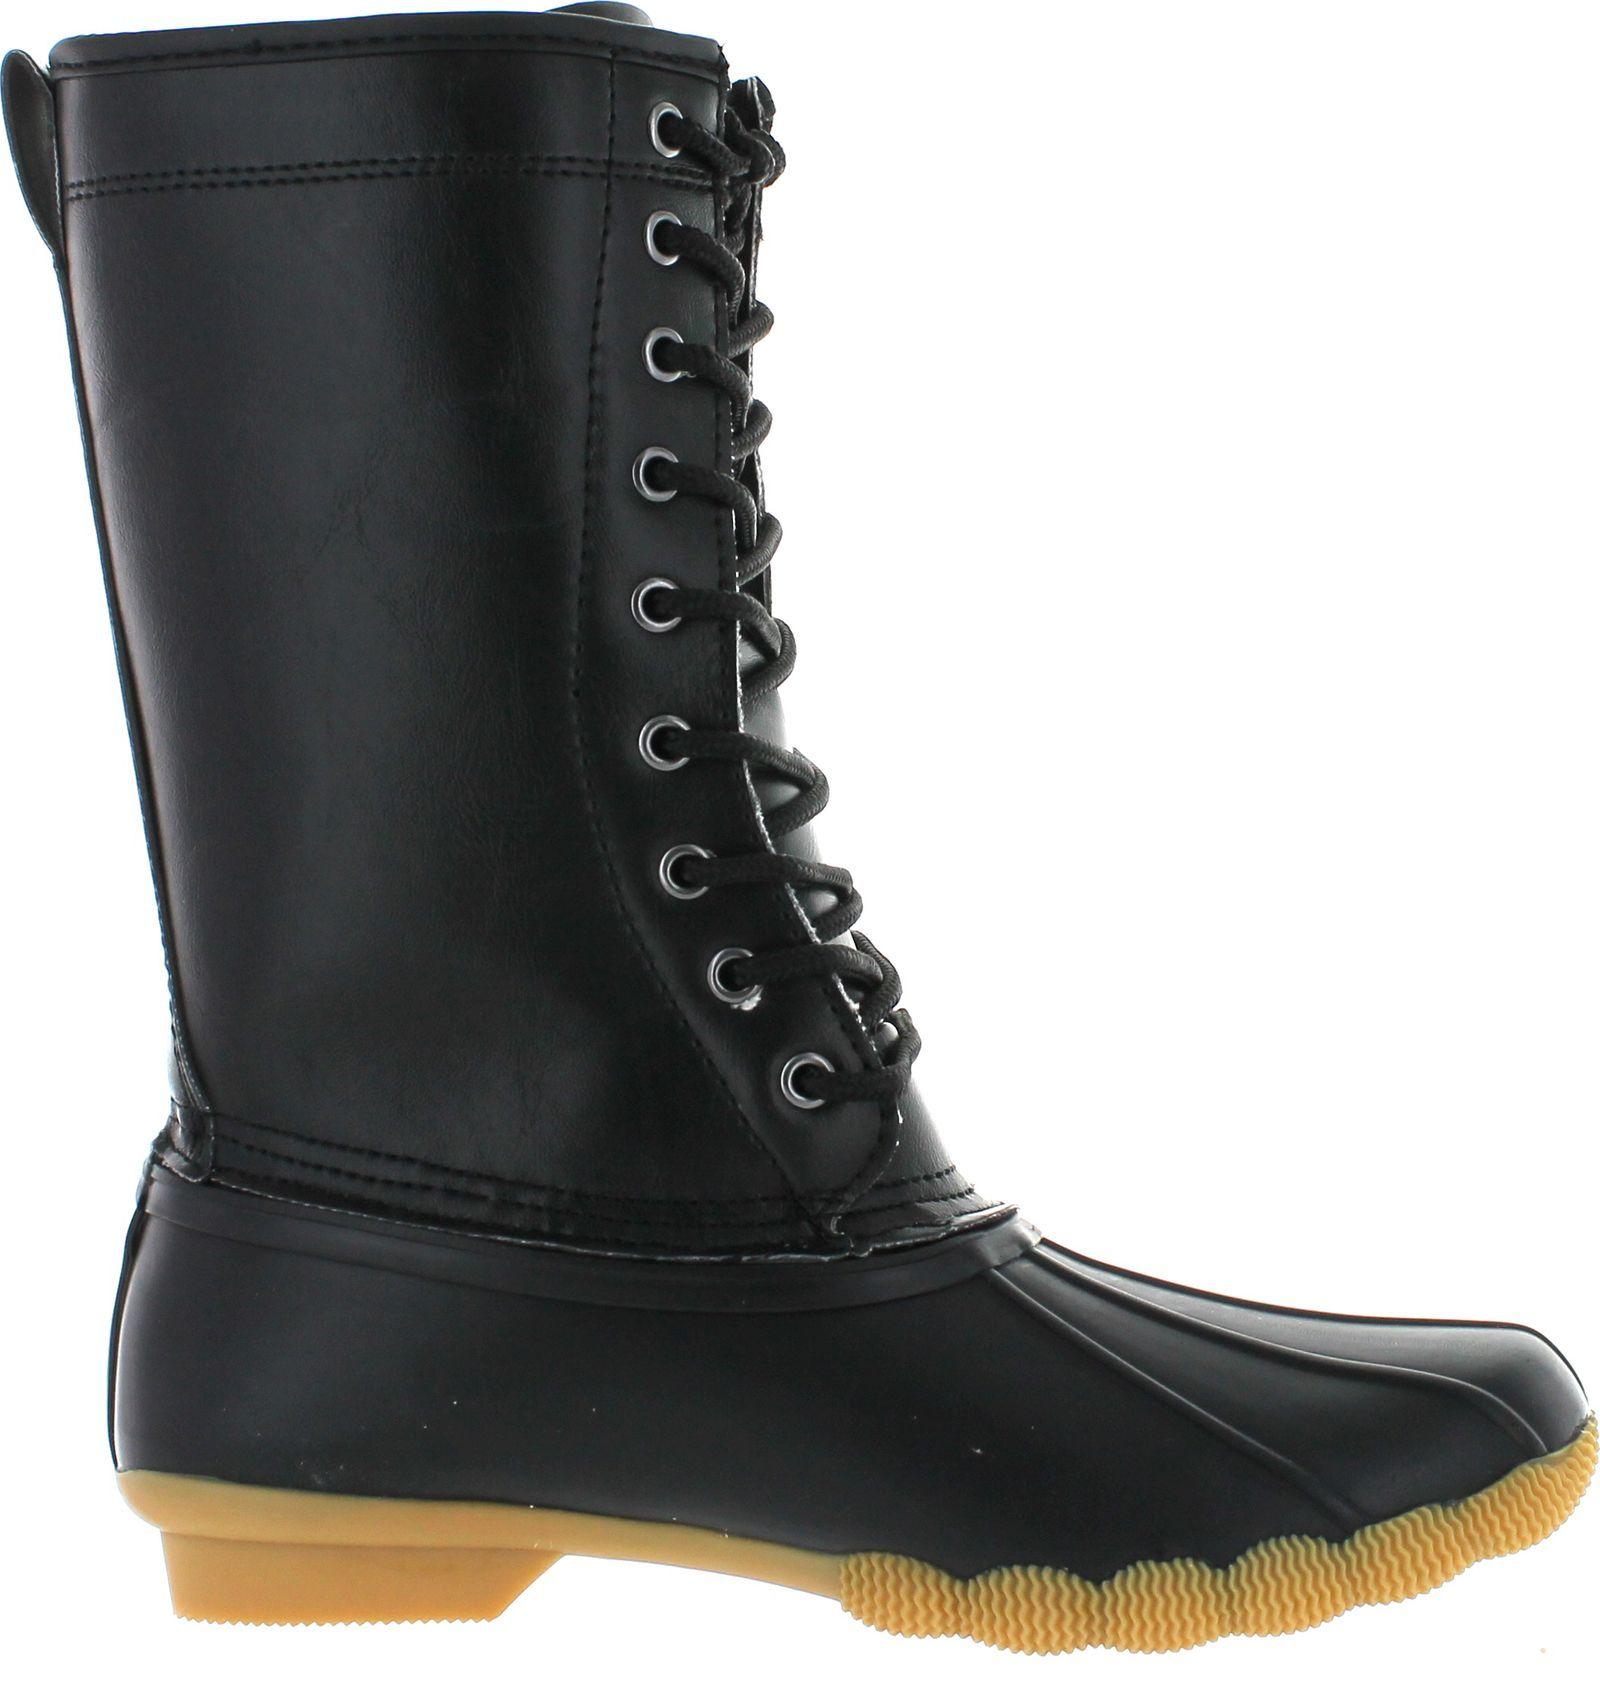 Luxury Womens Hunter Original Tartan Tall Winter Rain Boots Snow Wellingtons US 5-11 | EBay